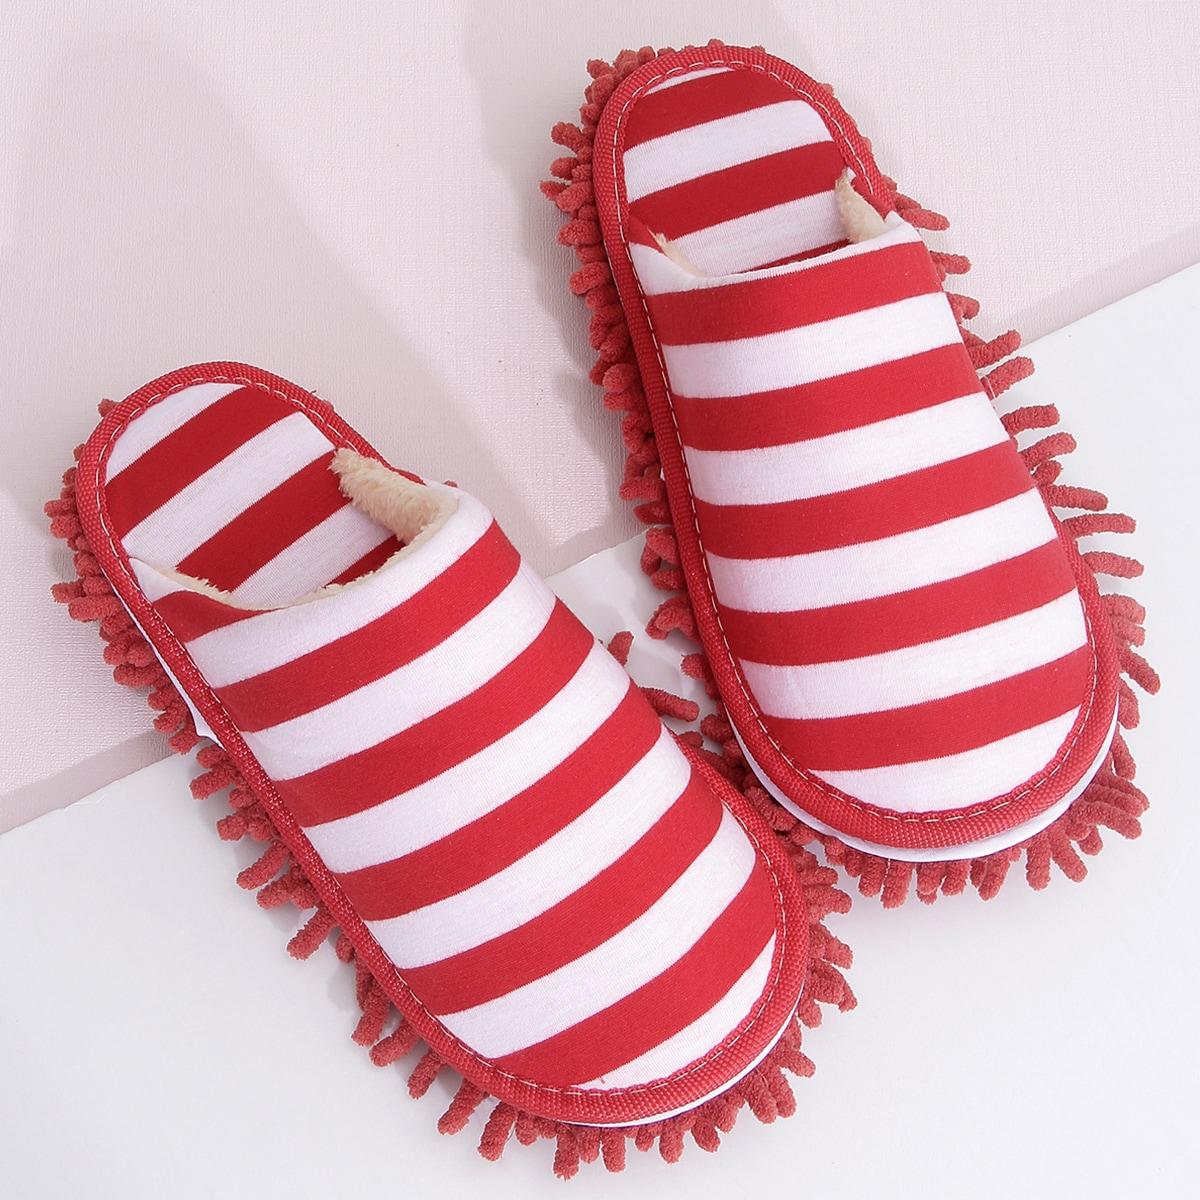 SHEIN / Chenille Fringe Decor Striped Bedroom Slippers